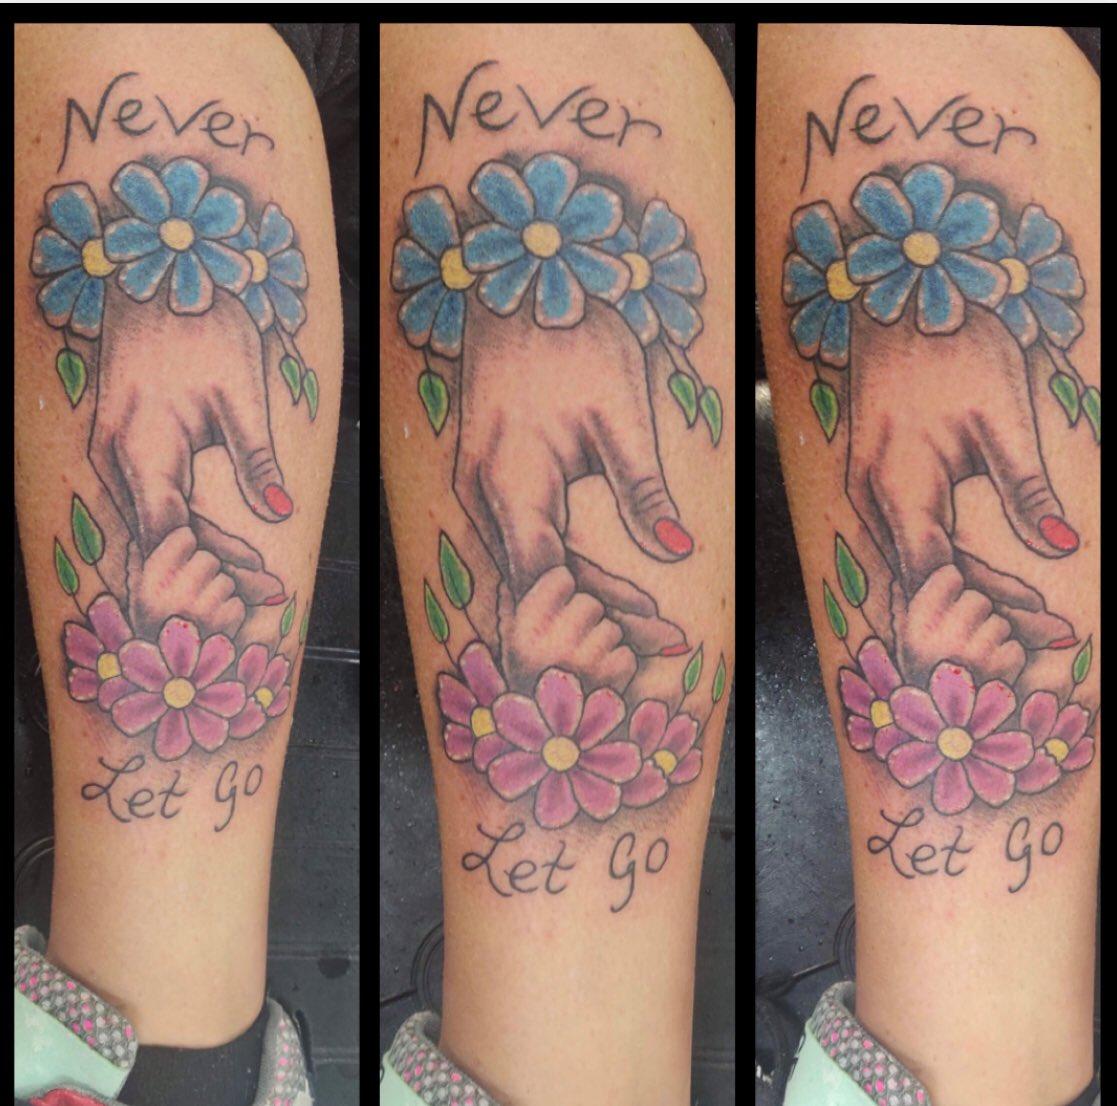 #kingtattoo1 #ink #tattoo #handstattoo pic.twitter.com/dBpIXtiE5y